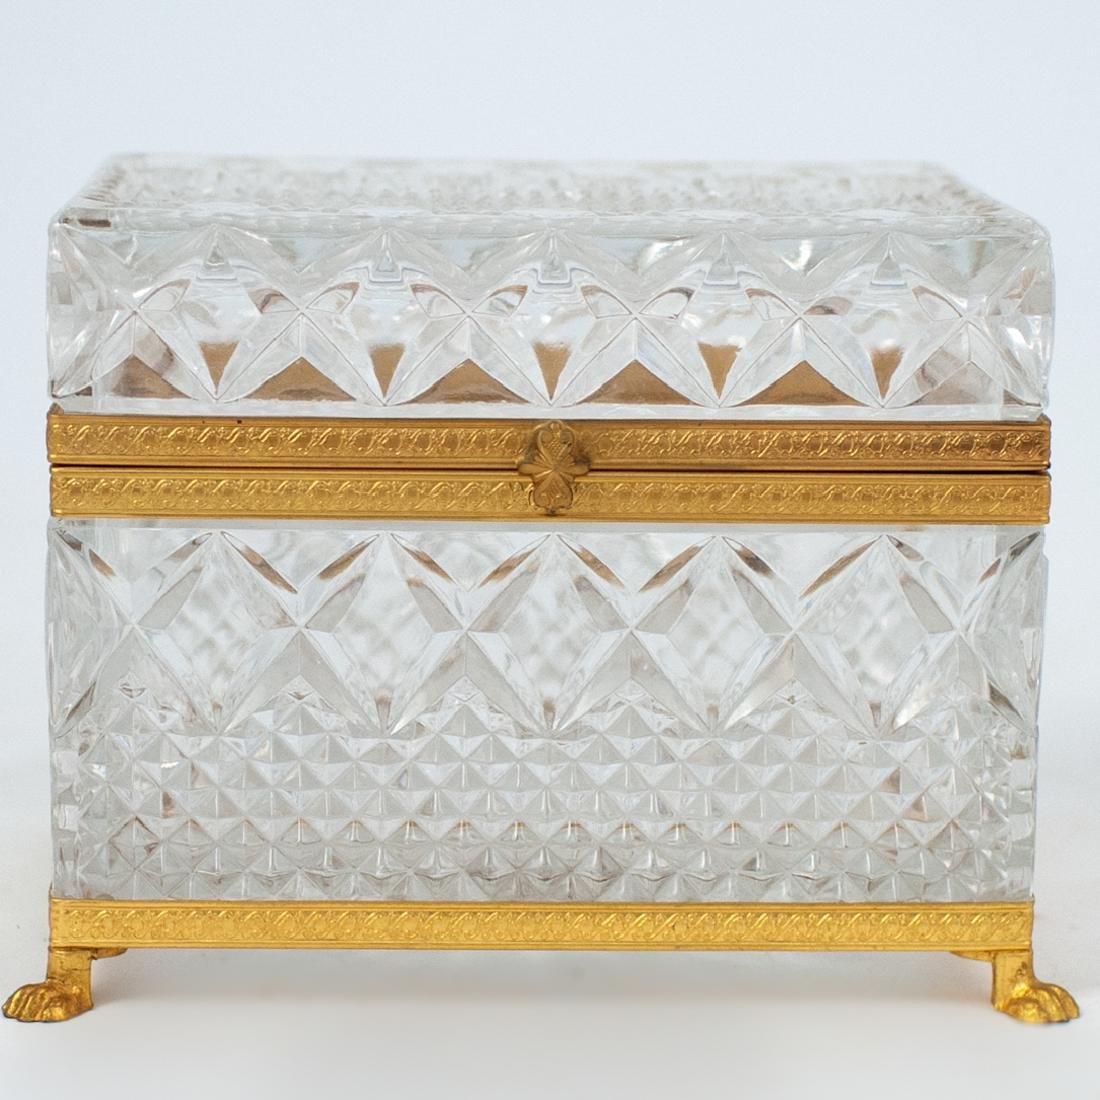 Antique Cut Crystal and Gilt Bronze Lidded Box